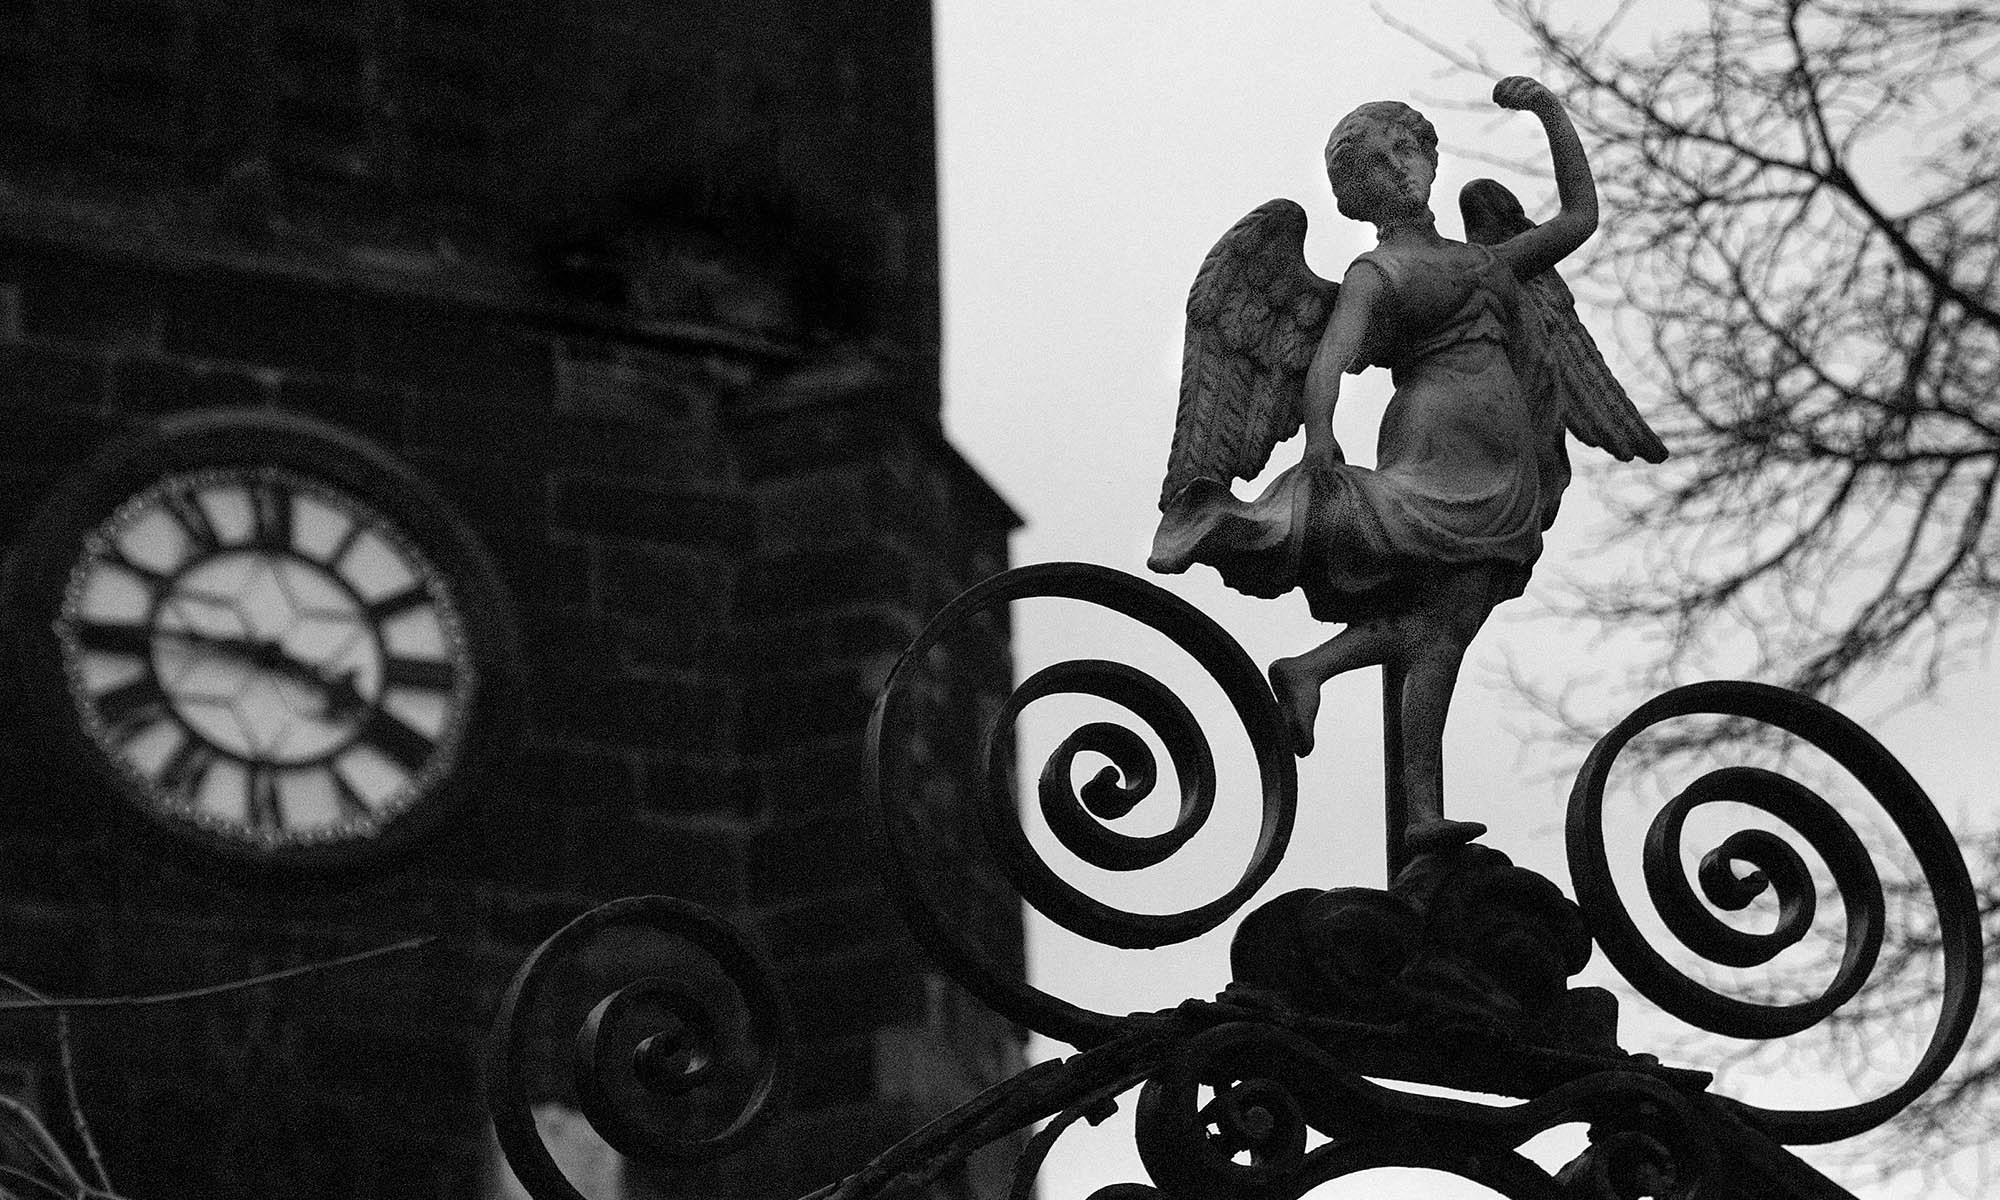 Church Clock and Statue detail